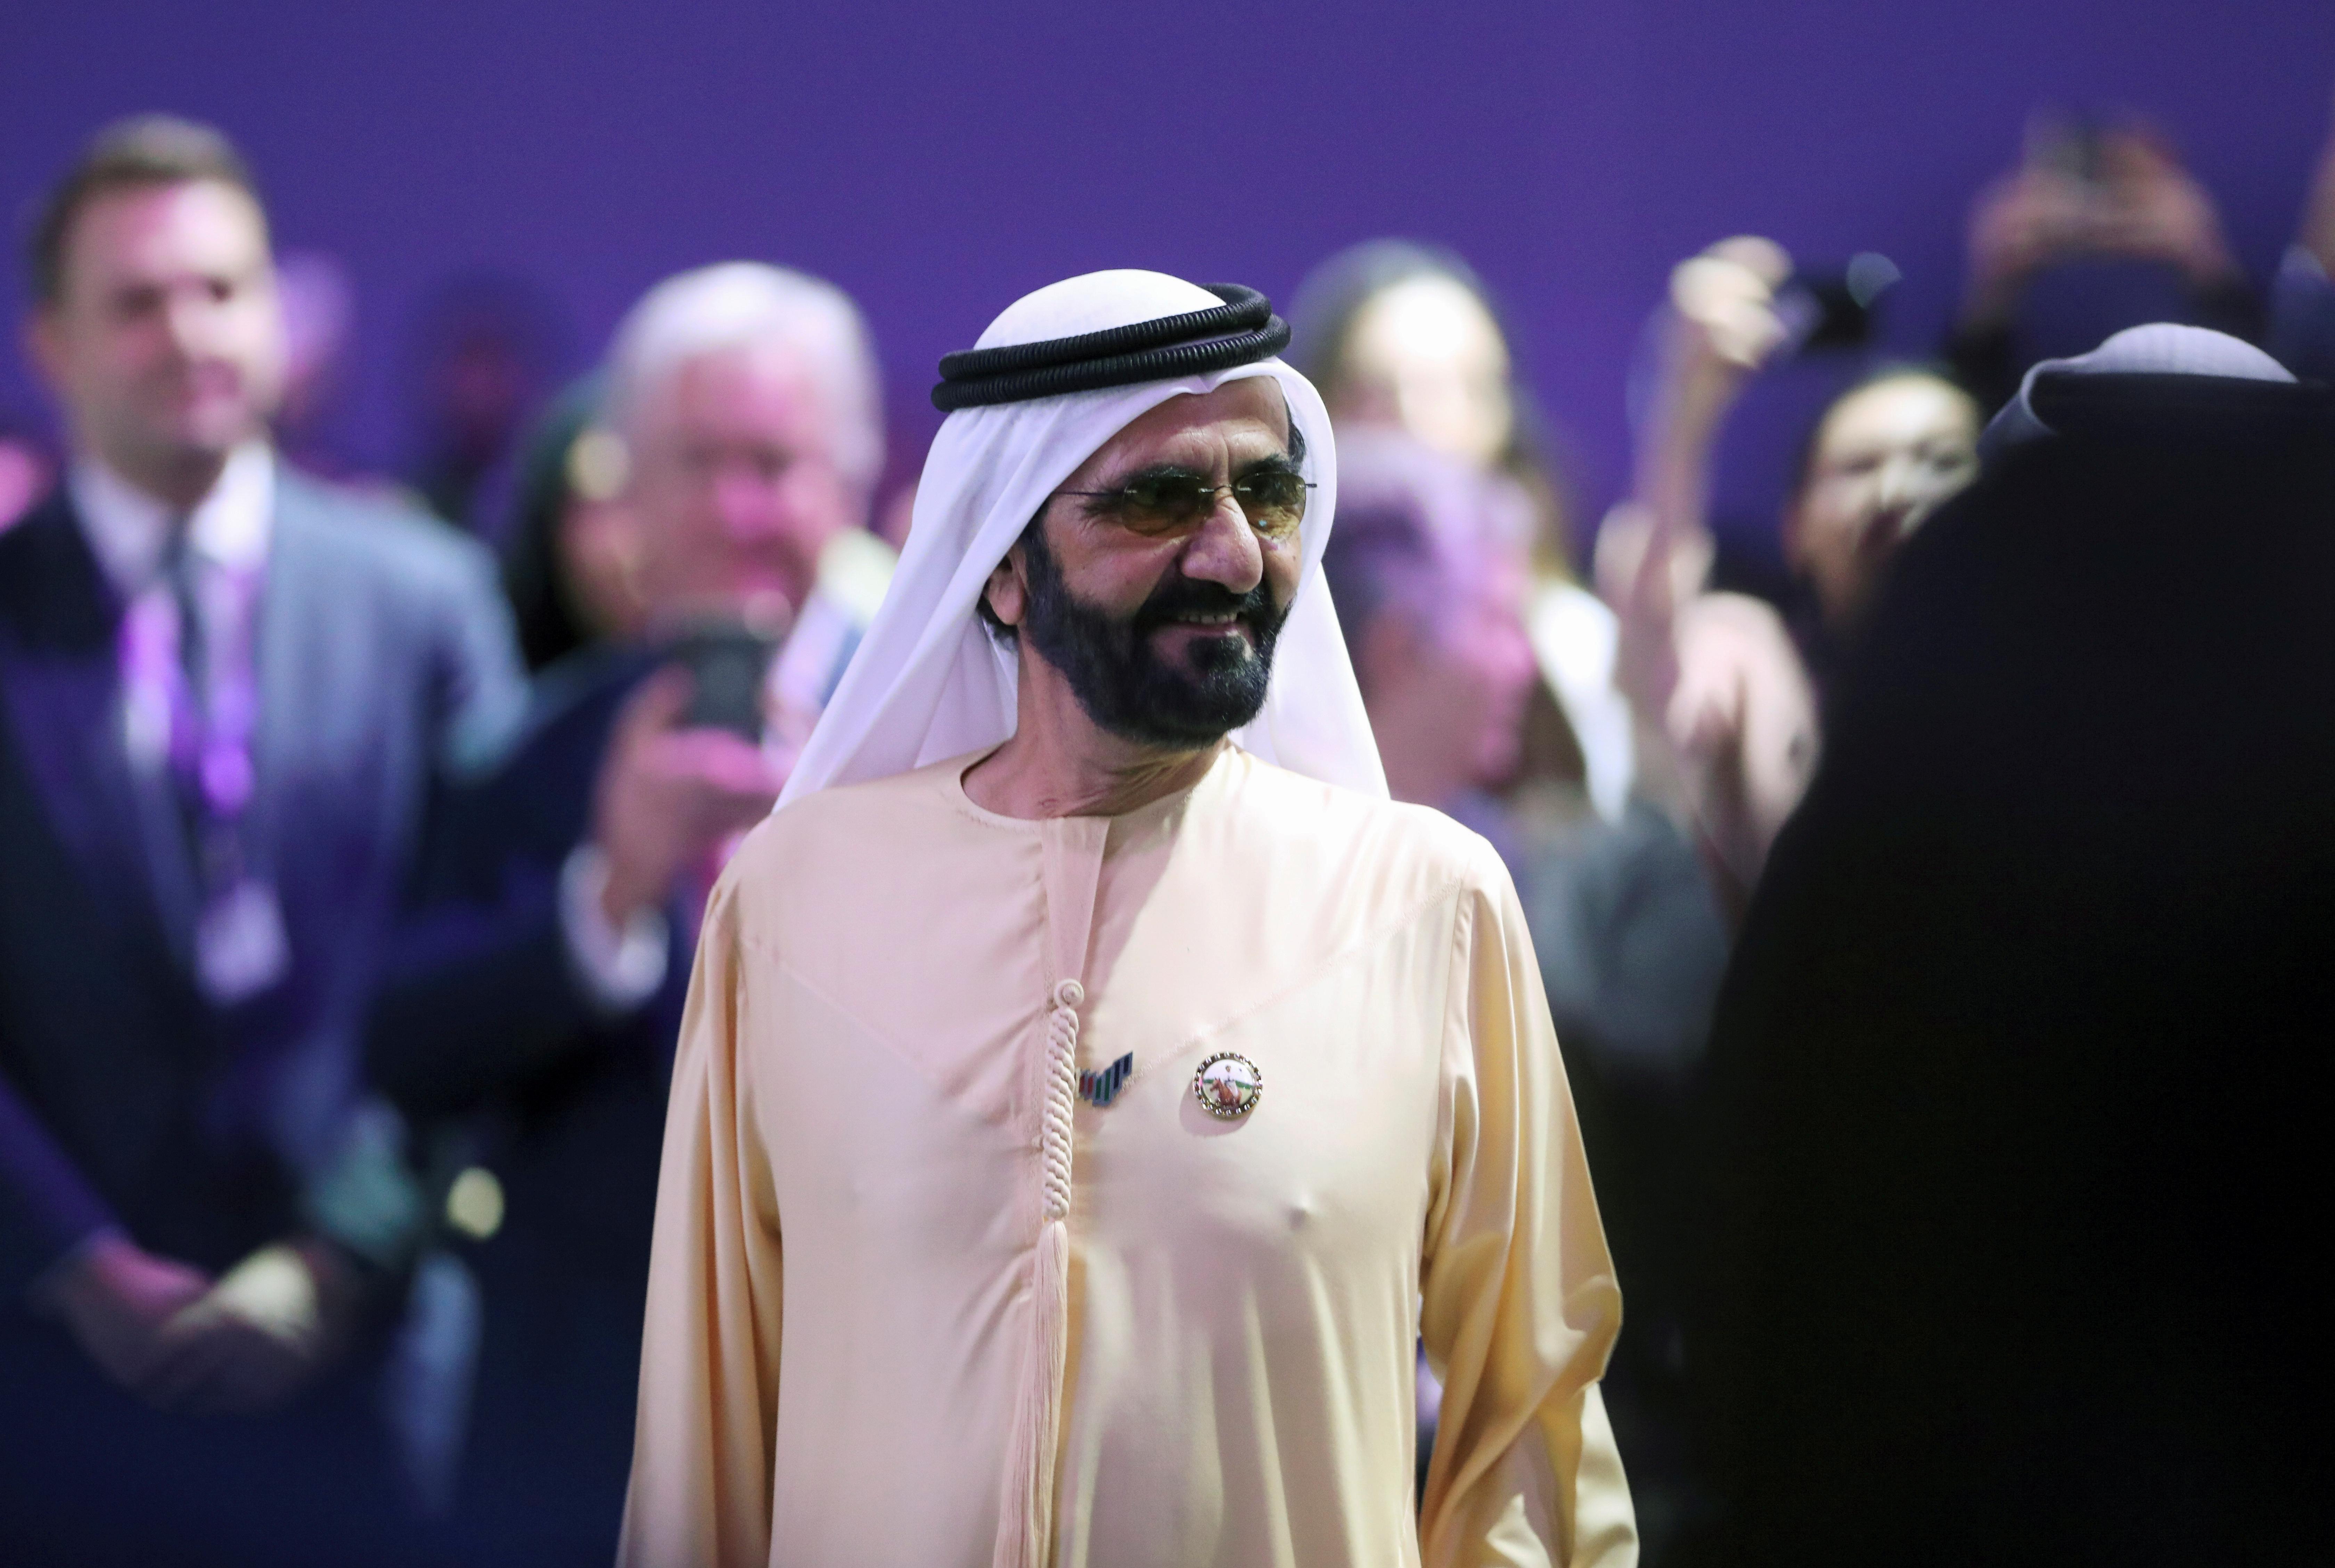 FILE PHOTO: Prime Minister and Vice-President of the United Arab Emirates and ruler of Dubai Sheikh Mohammed bin Rashid al-Maktoum attends the Global Women's Forum in Dubai